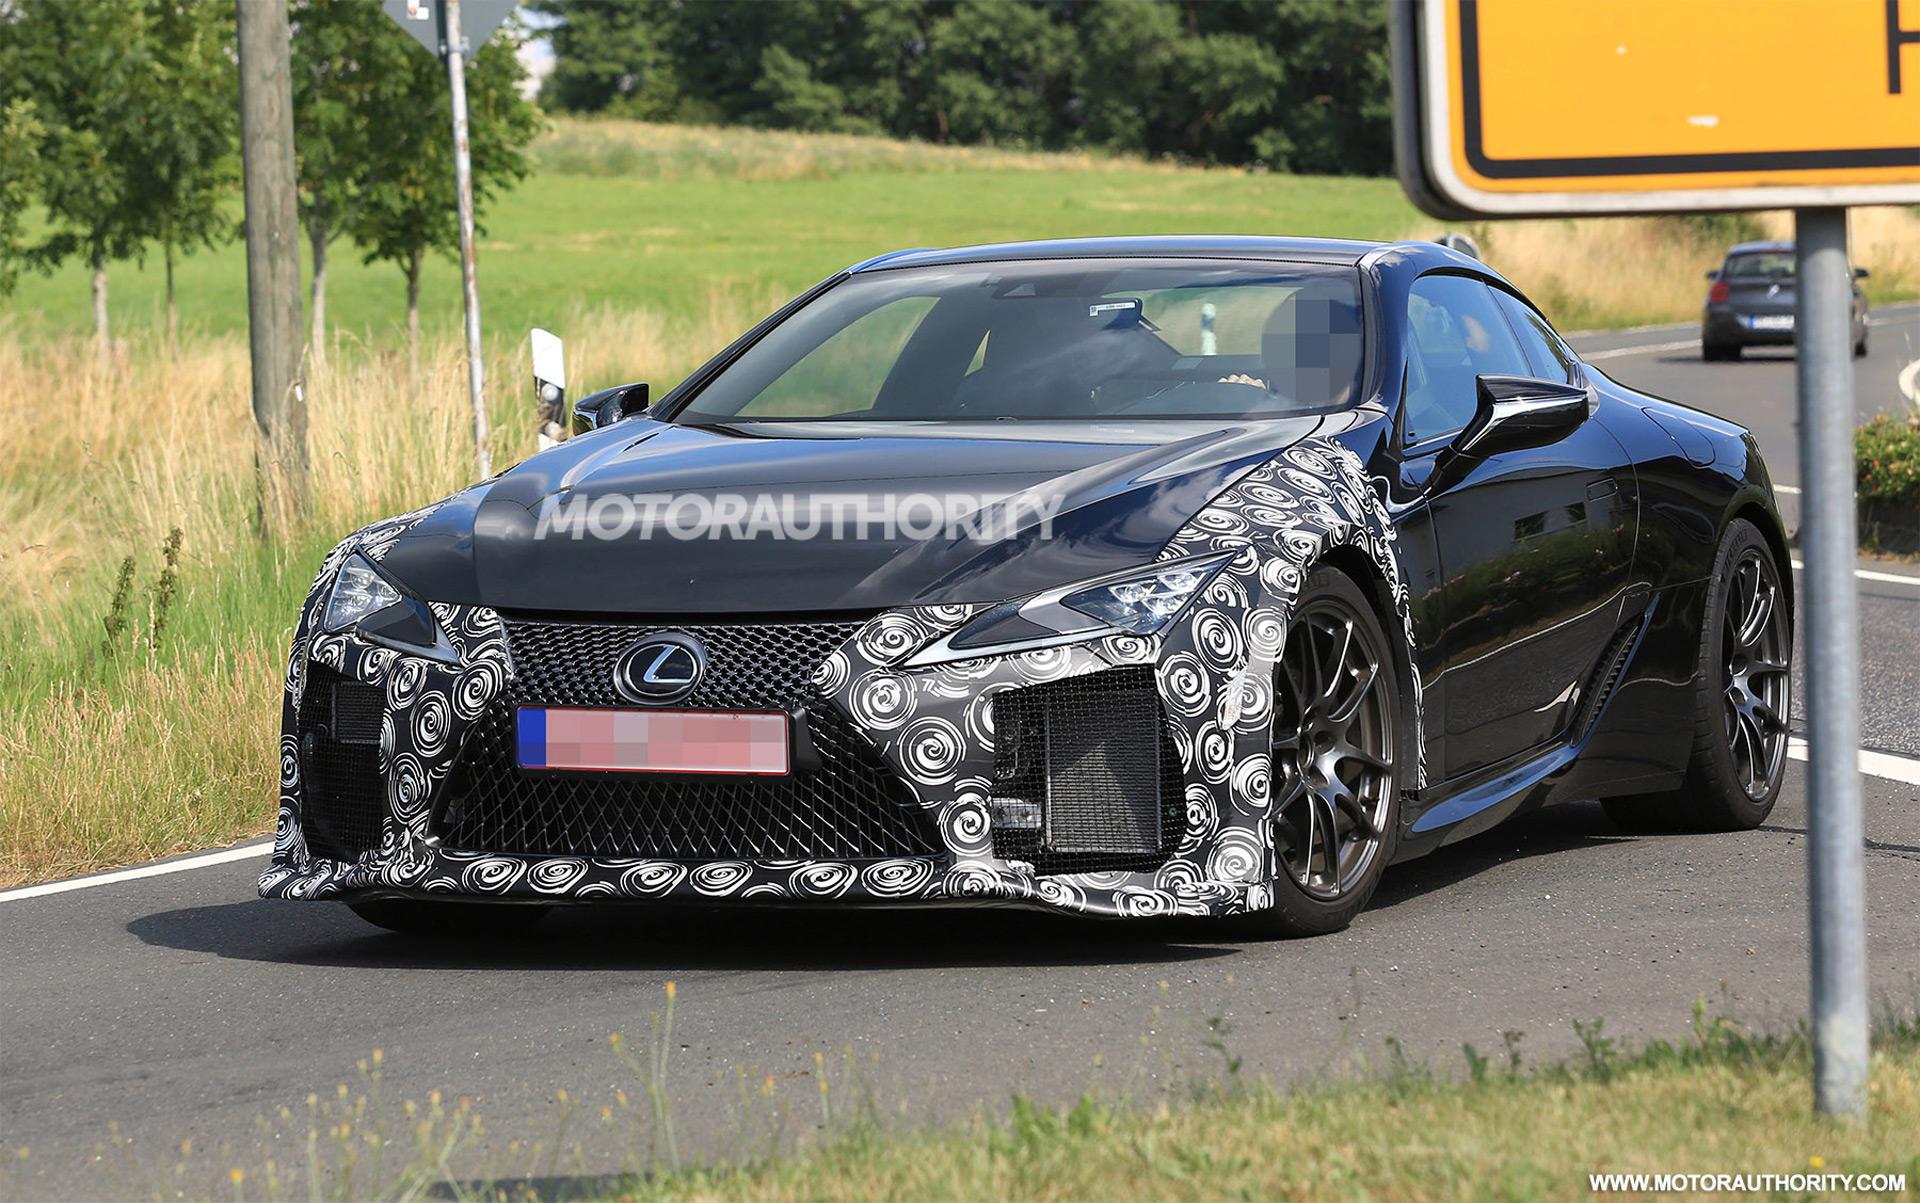 2021 Lexus Lc F Spy Shots